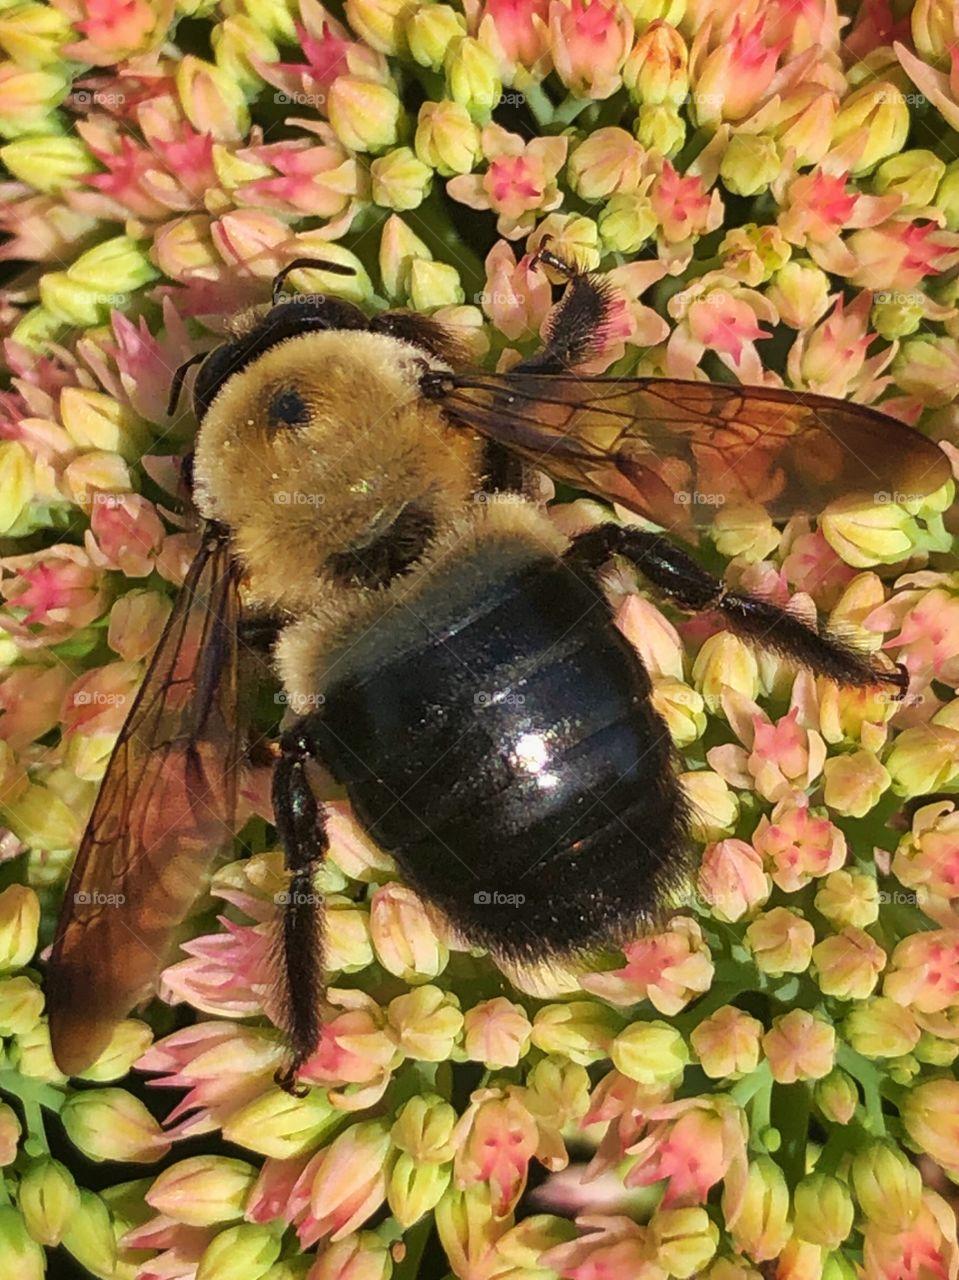 Bumblebee closeup on flowers